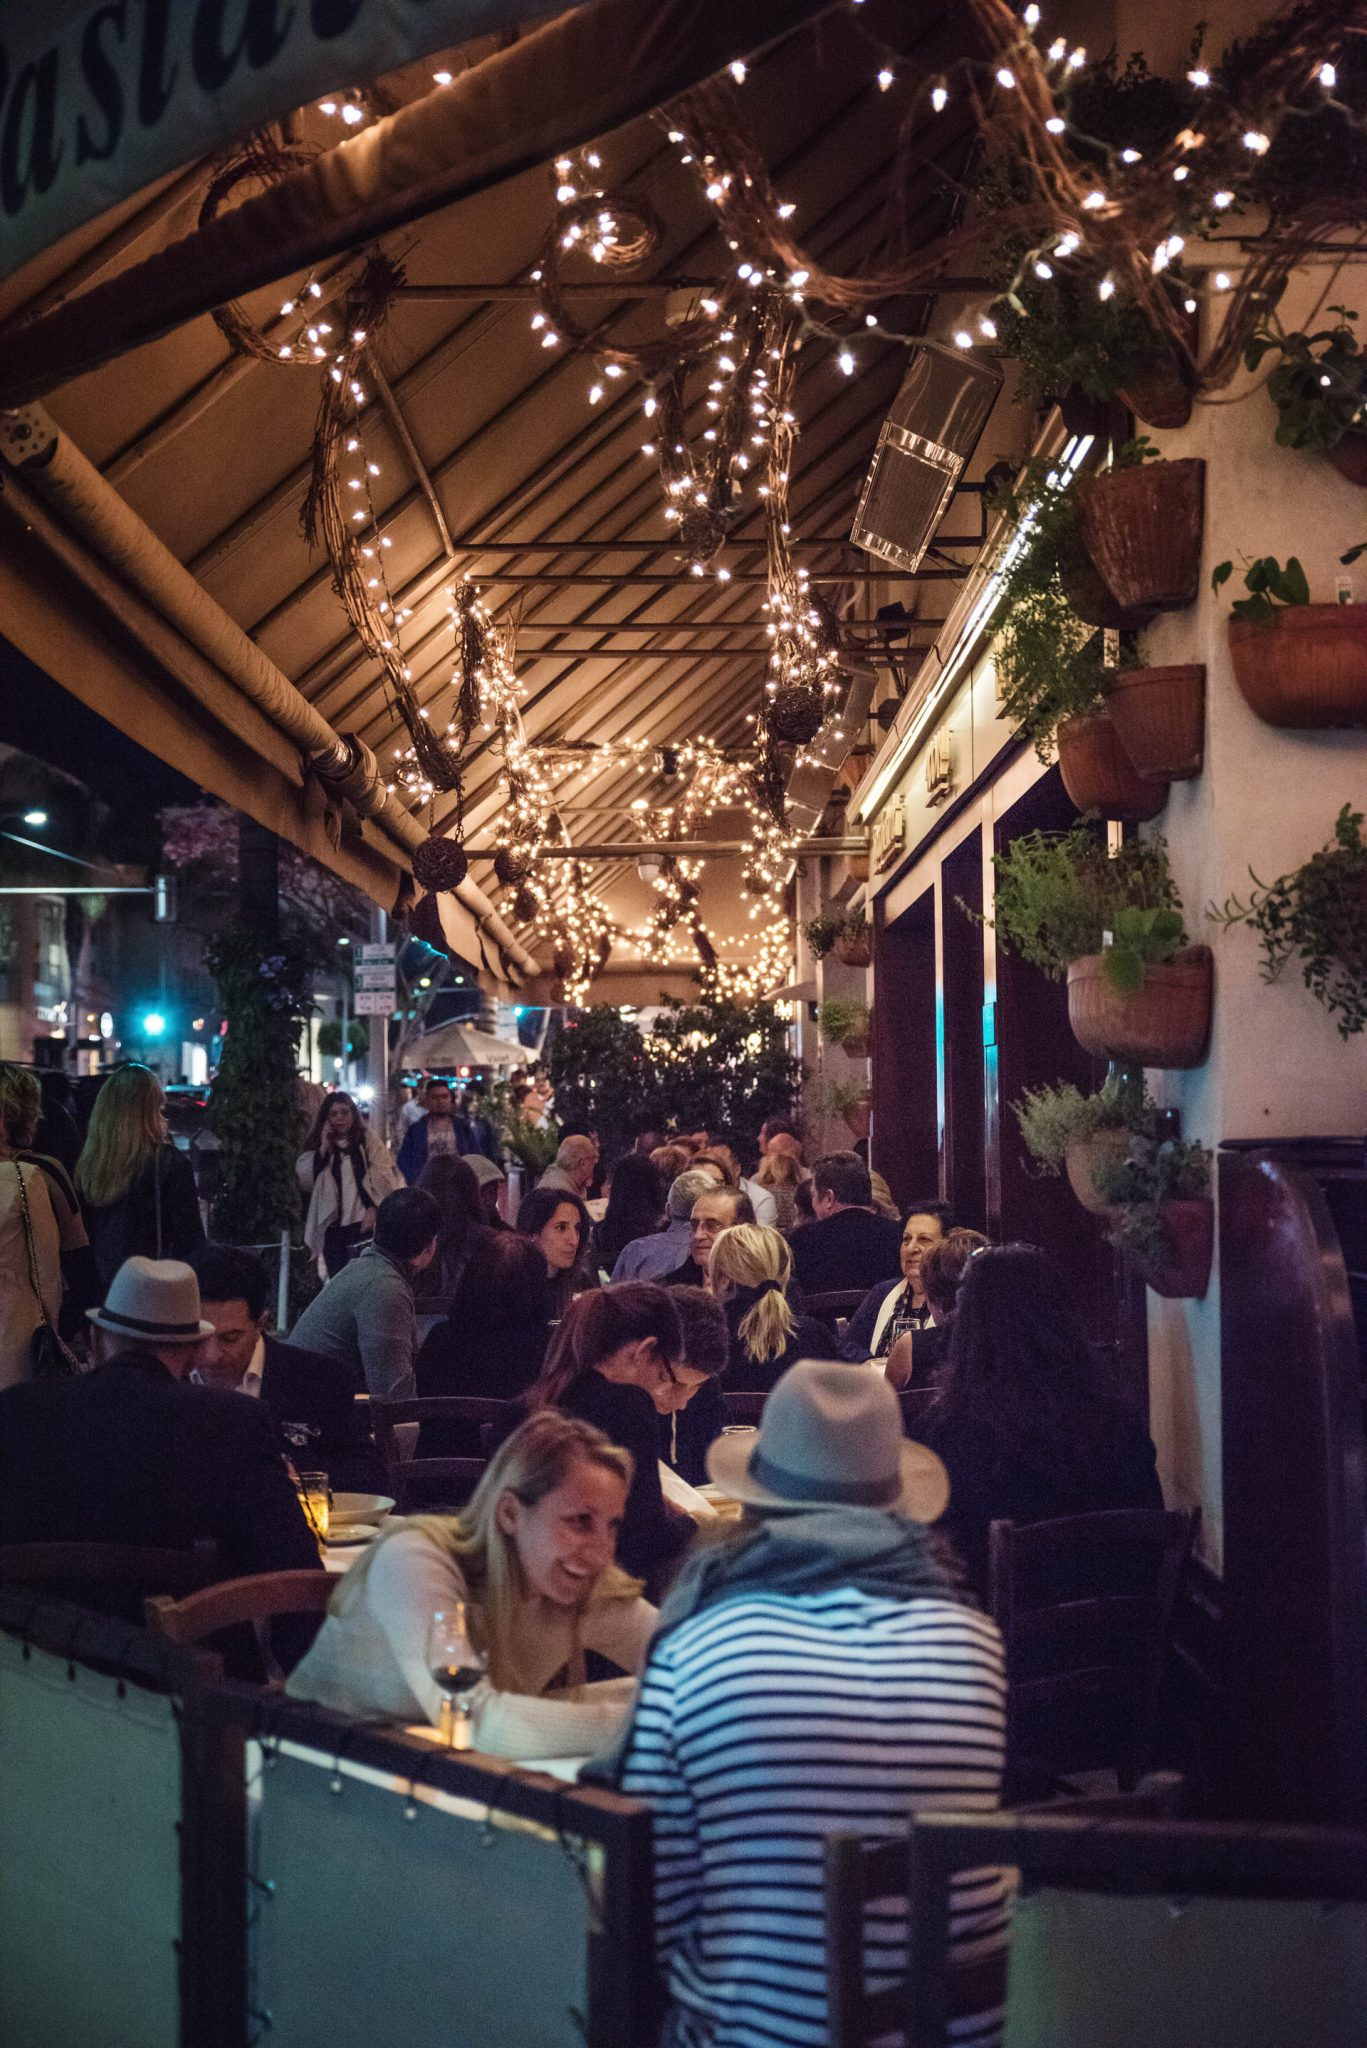 Il Pastaio | Beverly Hills Italian Restaurant-1648130591